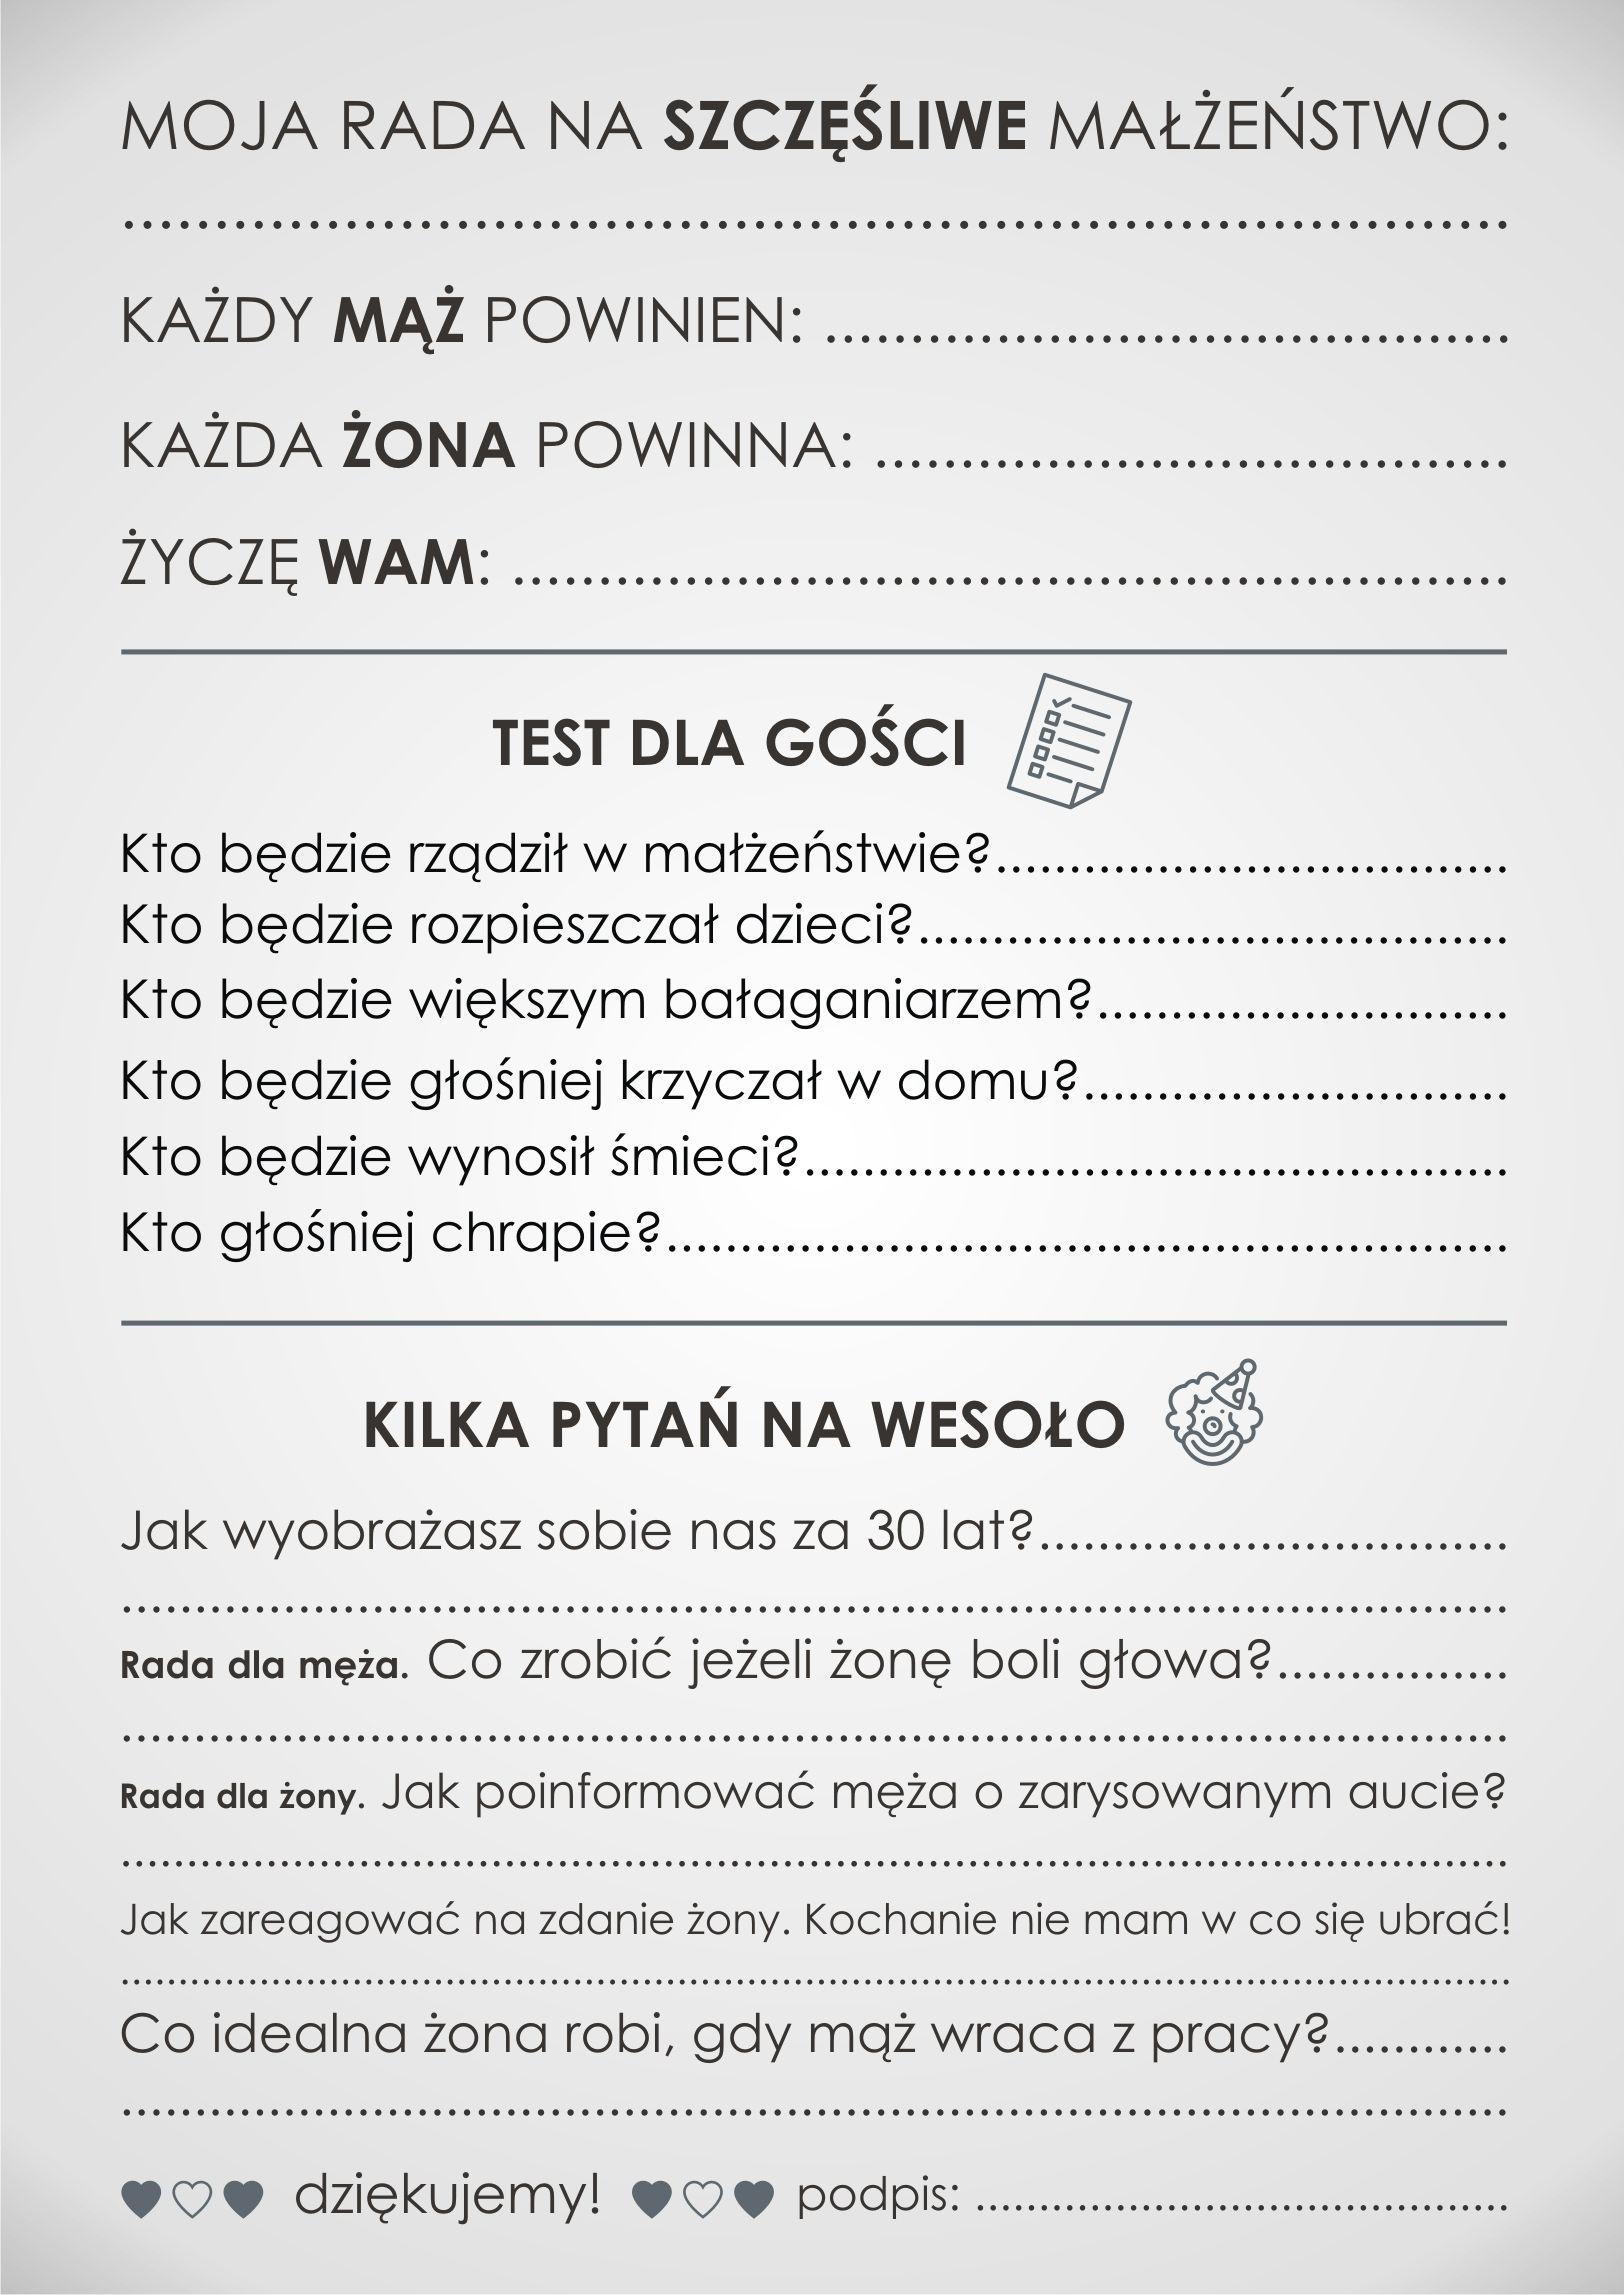 Ankieta Weselna Dla Gosci Dwustronna Pdf 7460195044 Allegro Pl Wedding Writing Wedding Vows Wedding Time